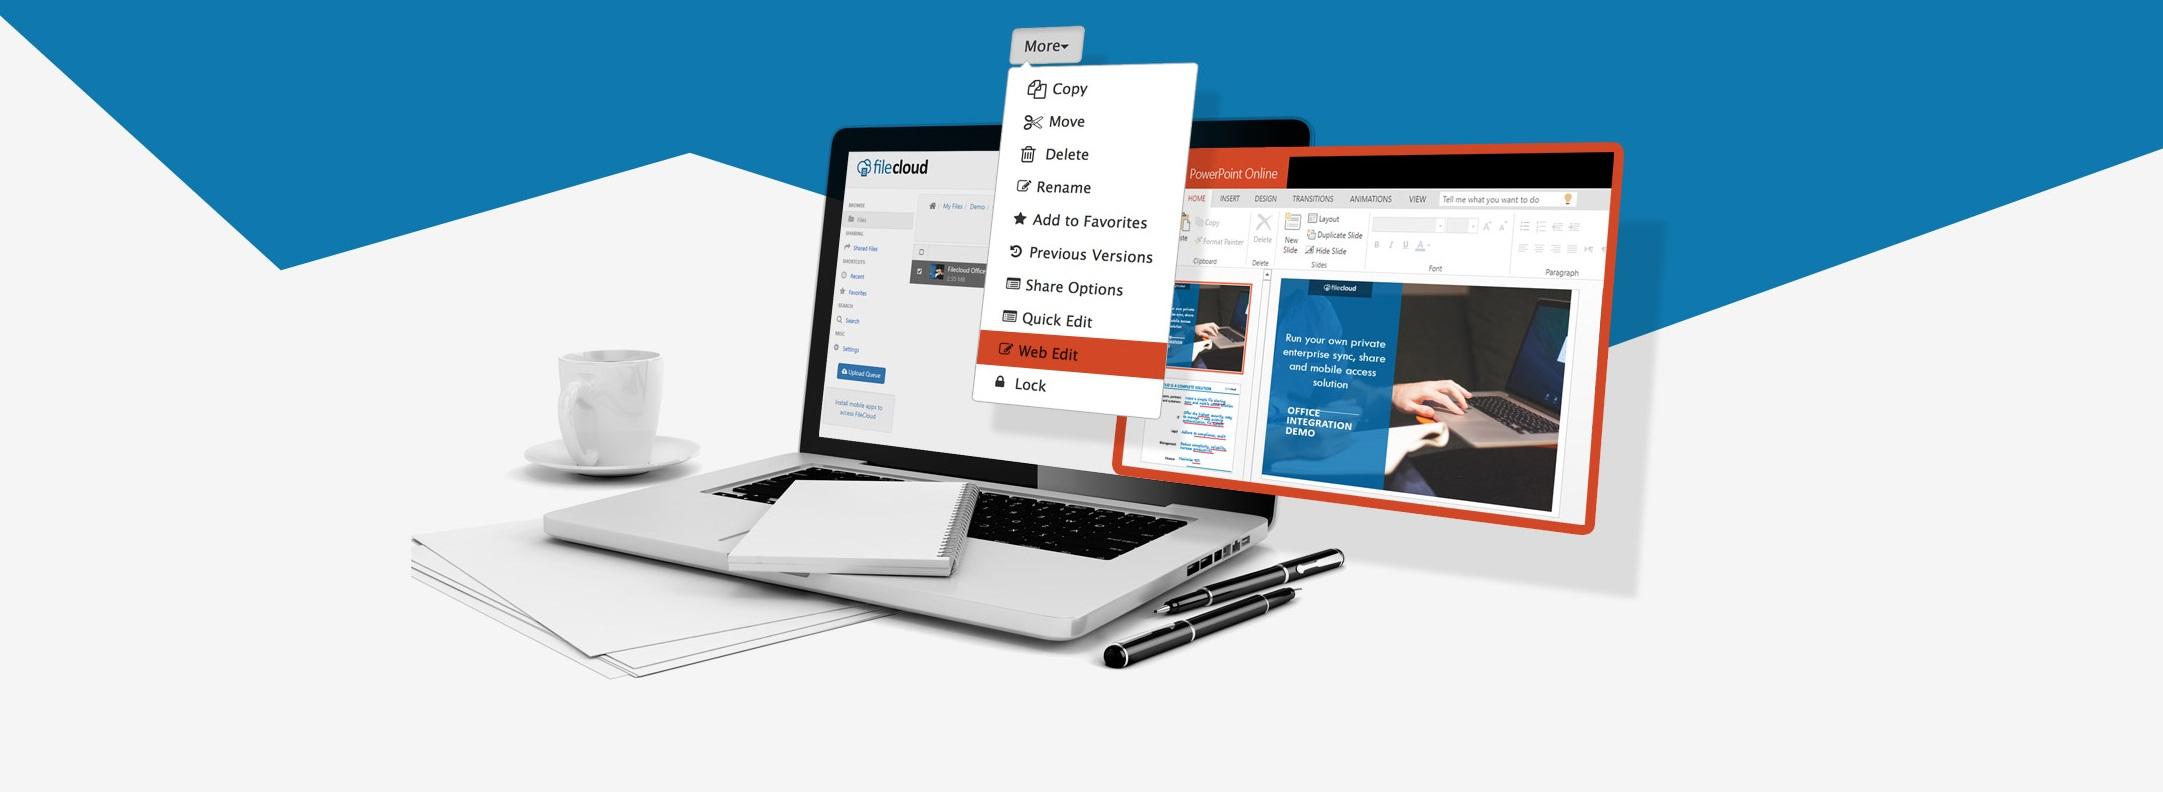 File Sharing for Enterprise - FileCloud